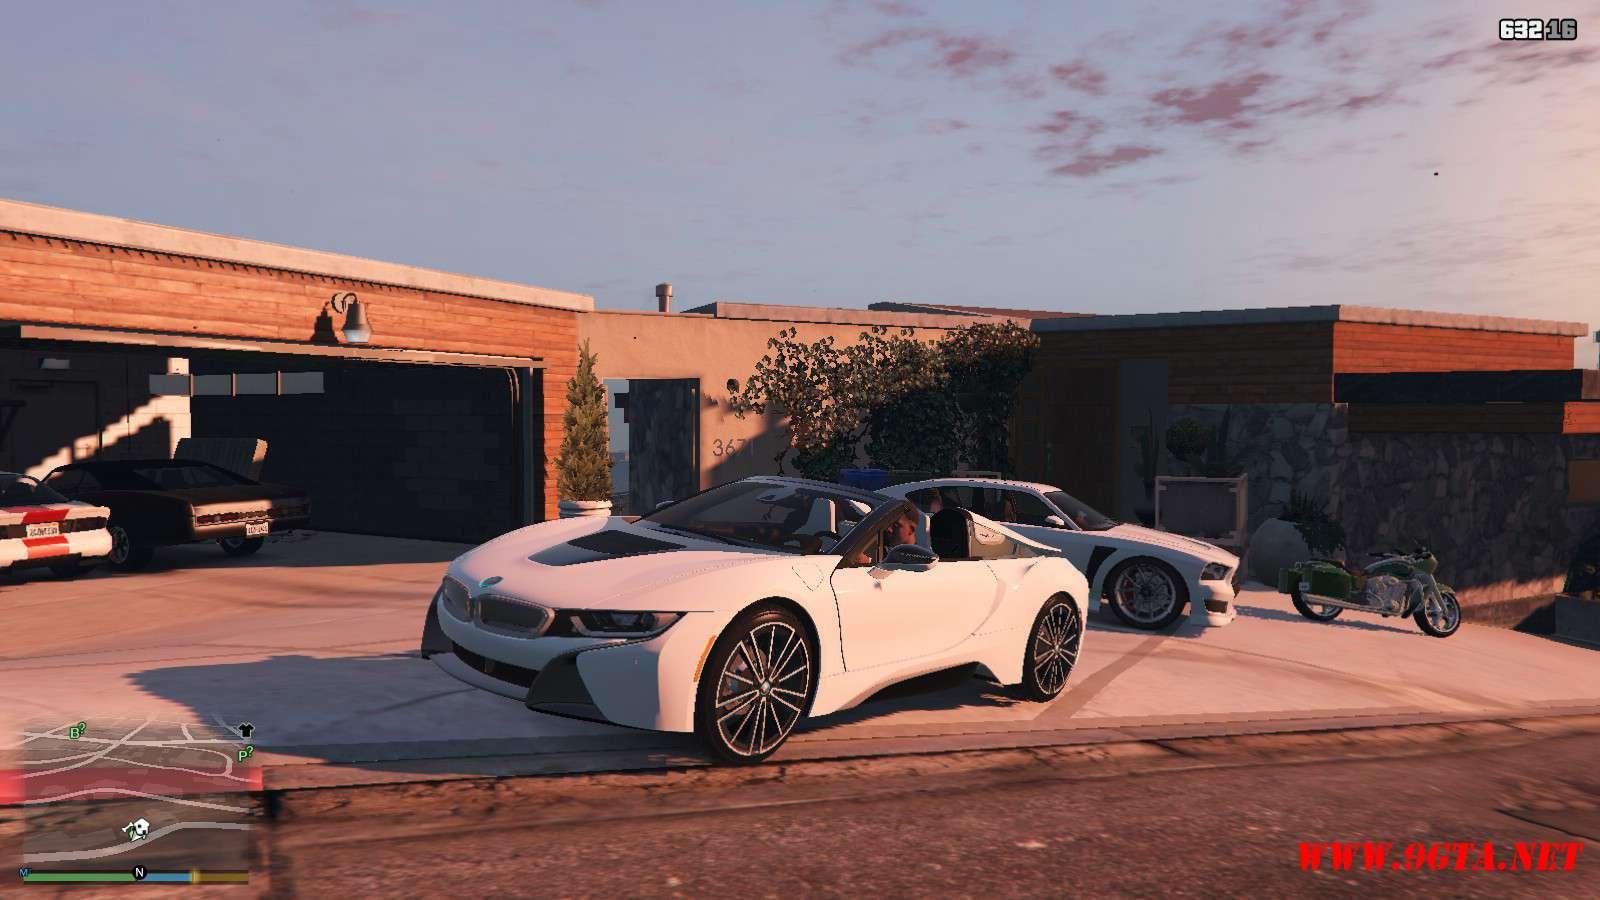 2019 BMW I8 Roadster GTA5 Mods (6)